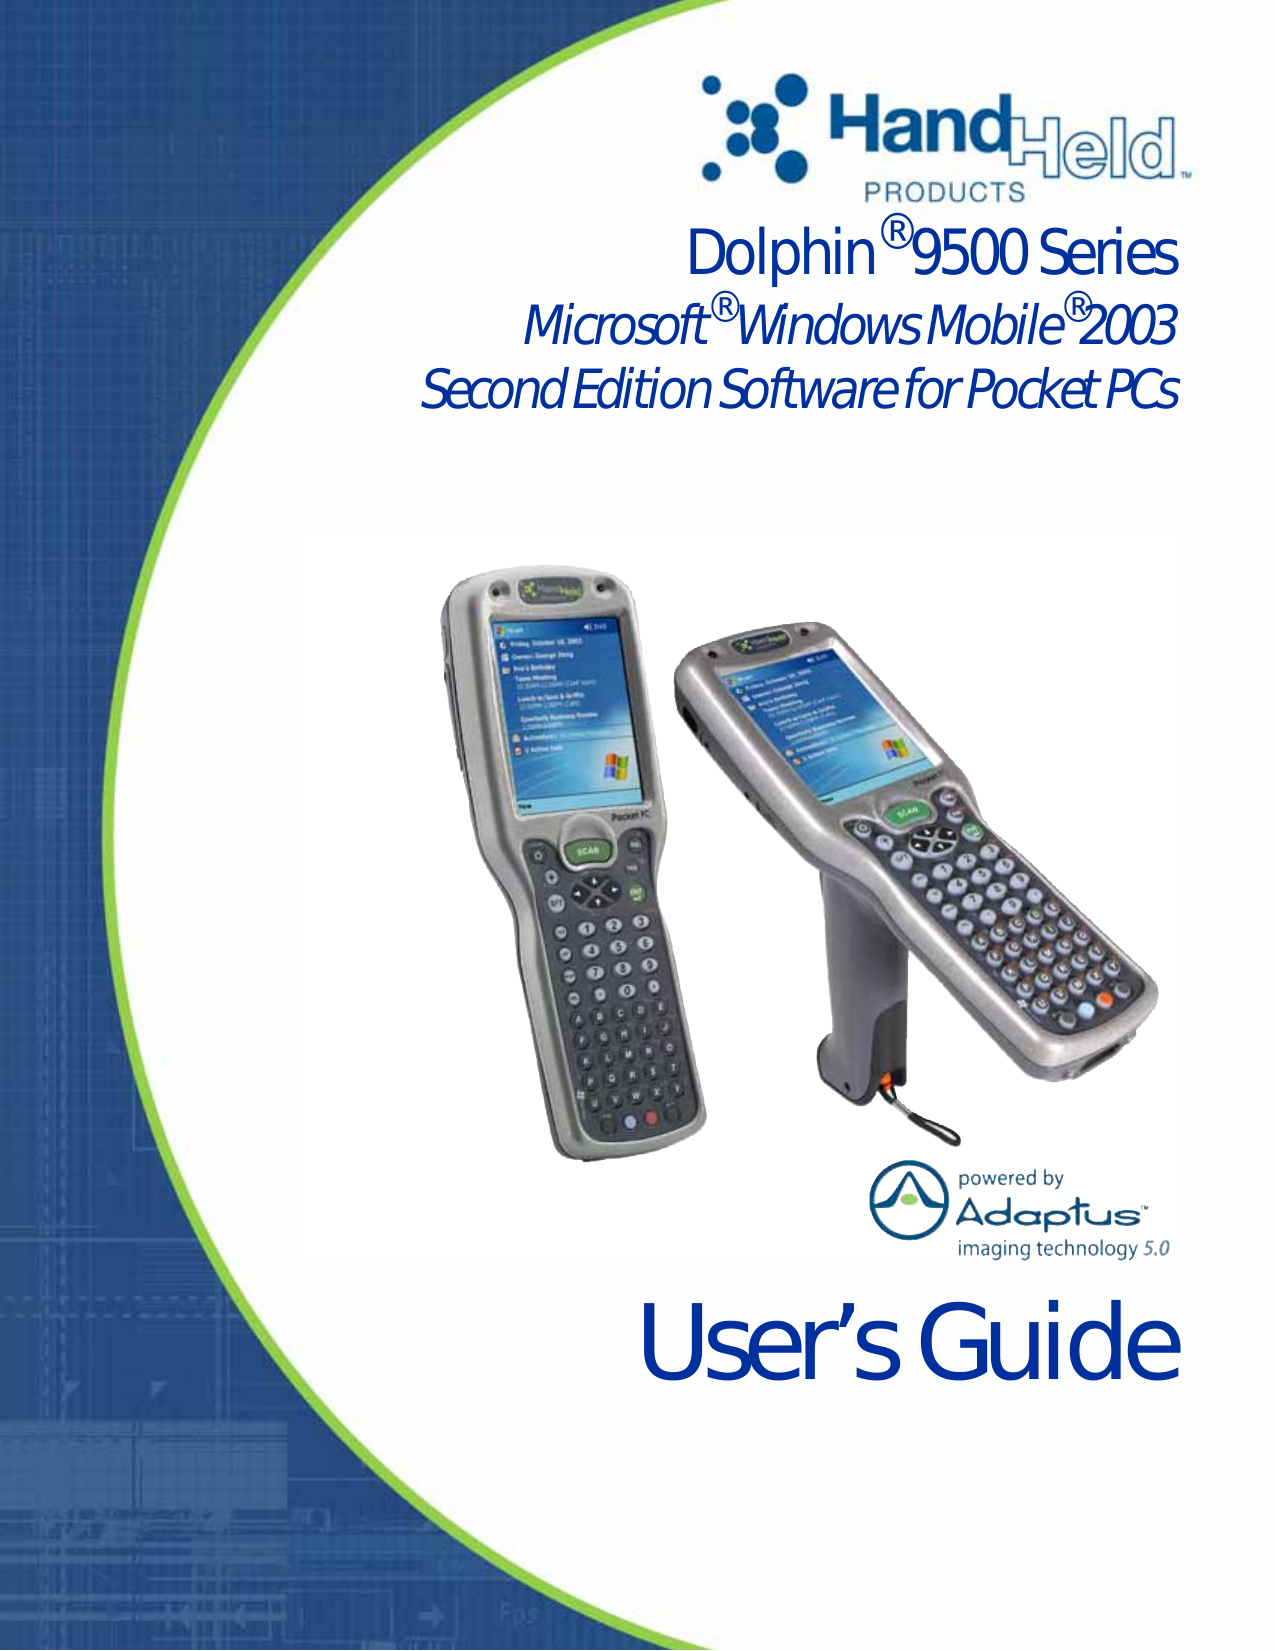 windows mobile 5 0 user guide expert user guide u2022 rh manualguidestudio today Windows Mobile 5 Updates Office Microsoft Mobile 5.0